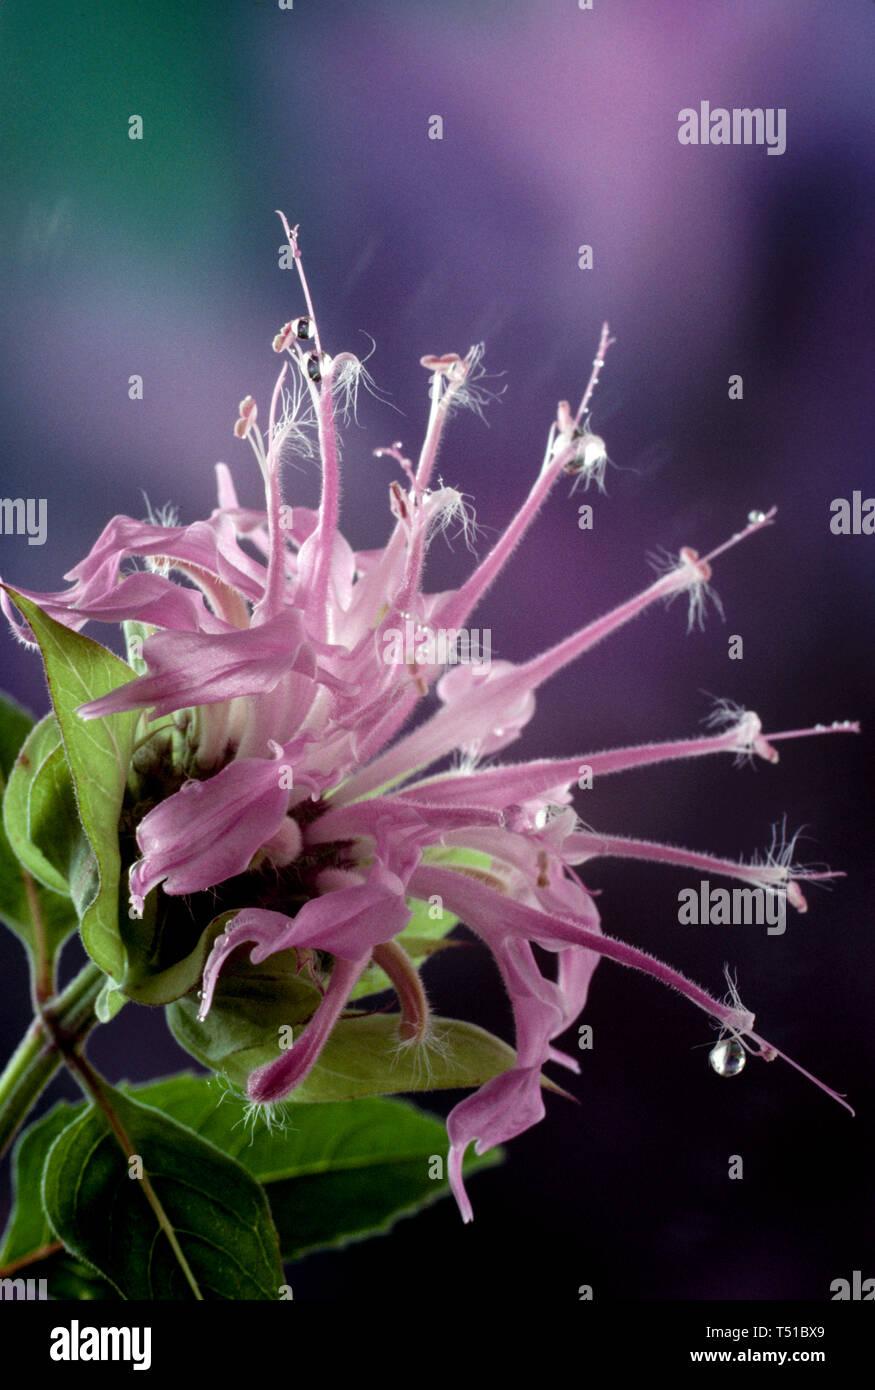 Monarda fistulosa, delicate pink monarda flower or bee balm, flower close up with dew drops on petals, USA - Stock Image